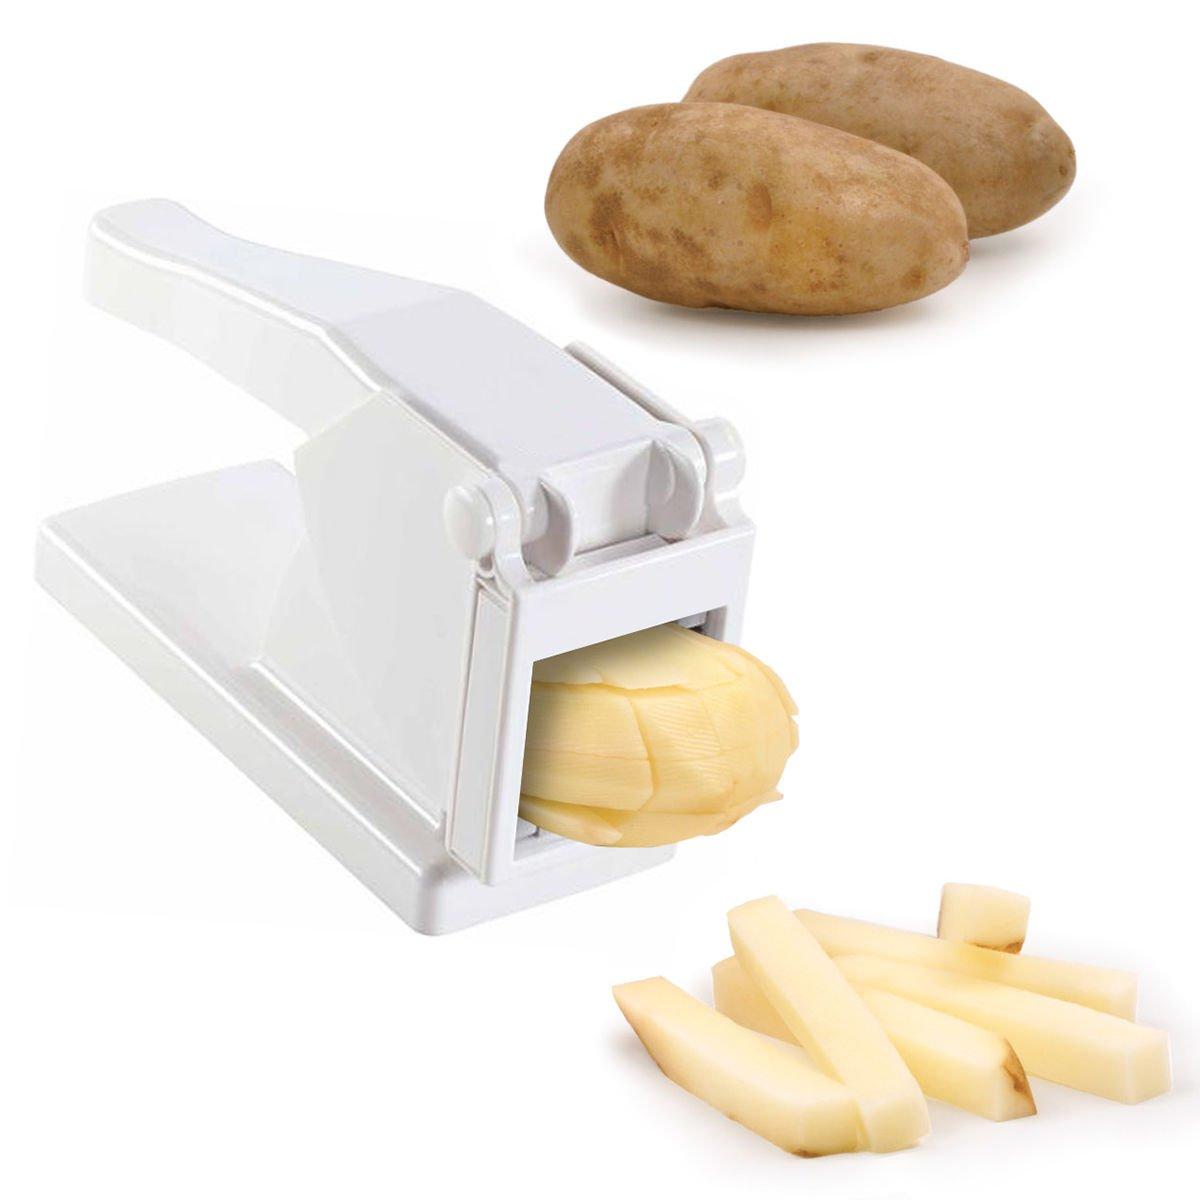 Amazon.com: French Fry Cutter by Cobble Creek Potato Press Slice ...